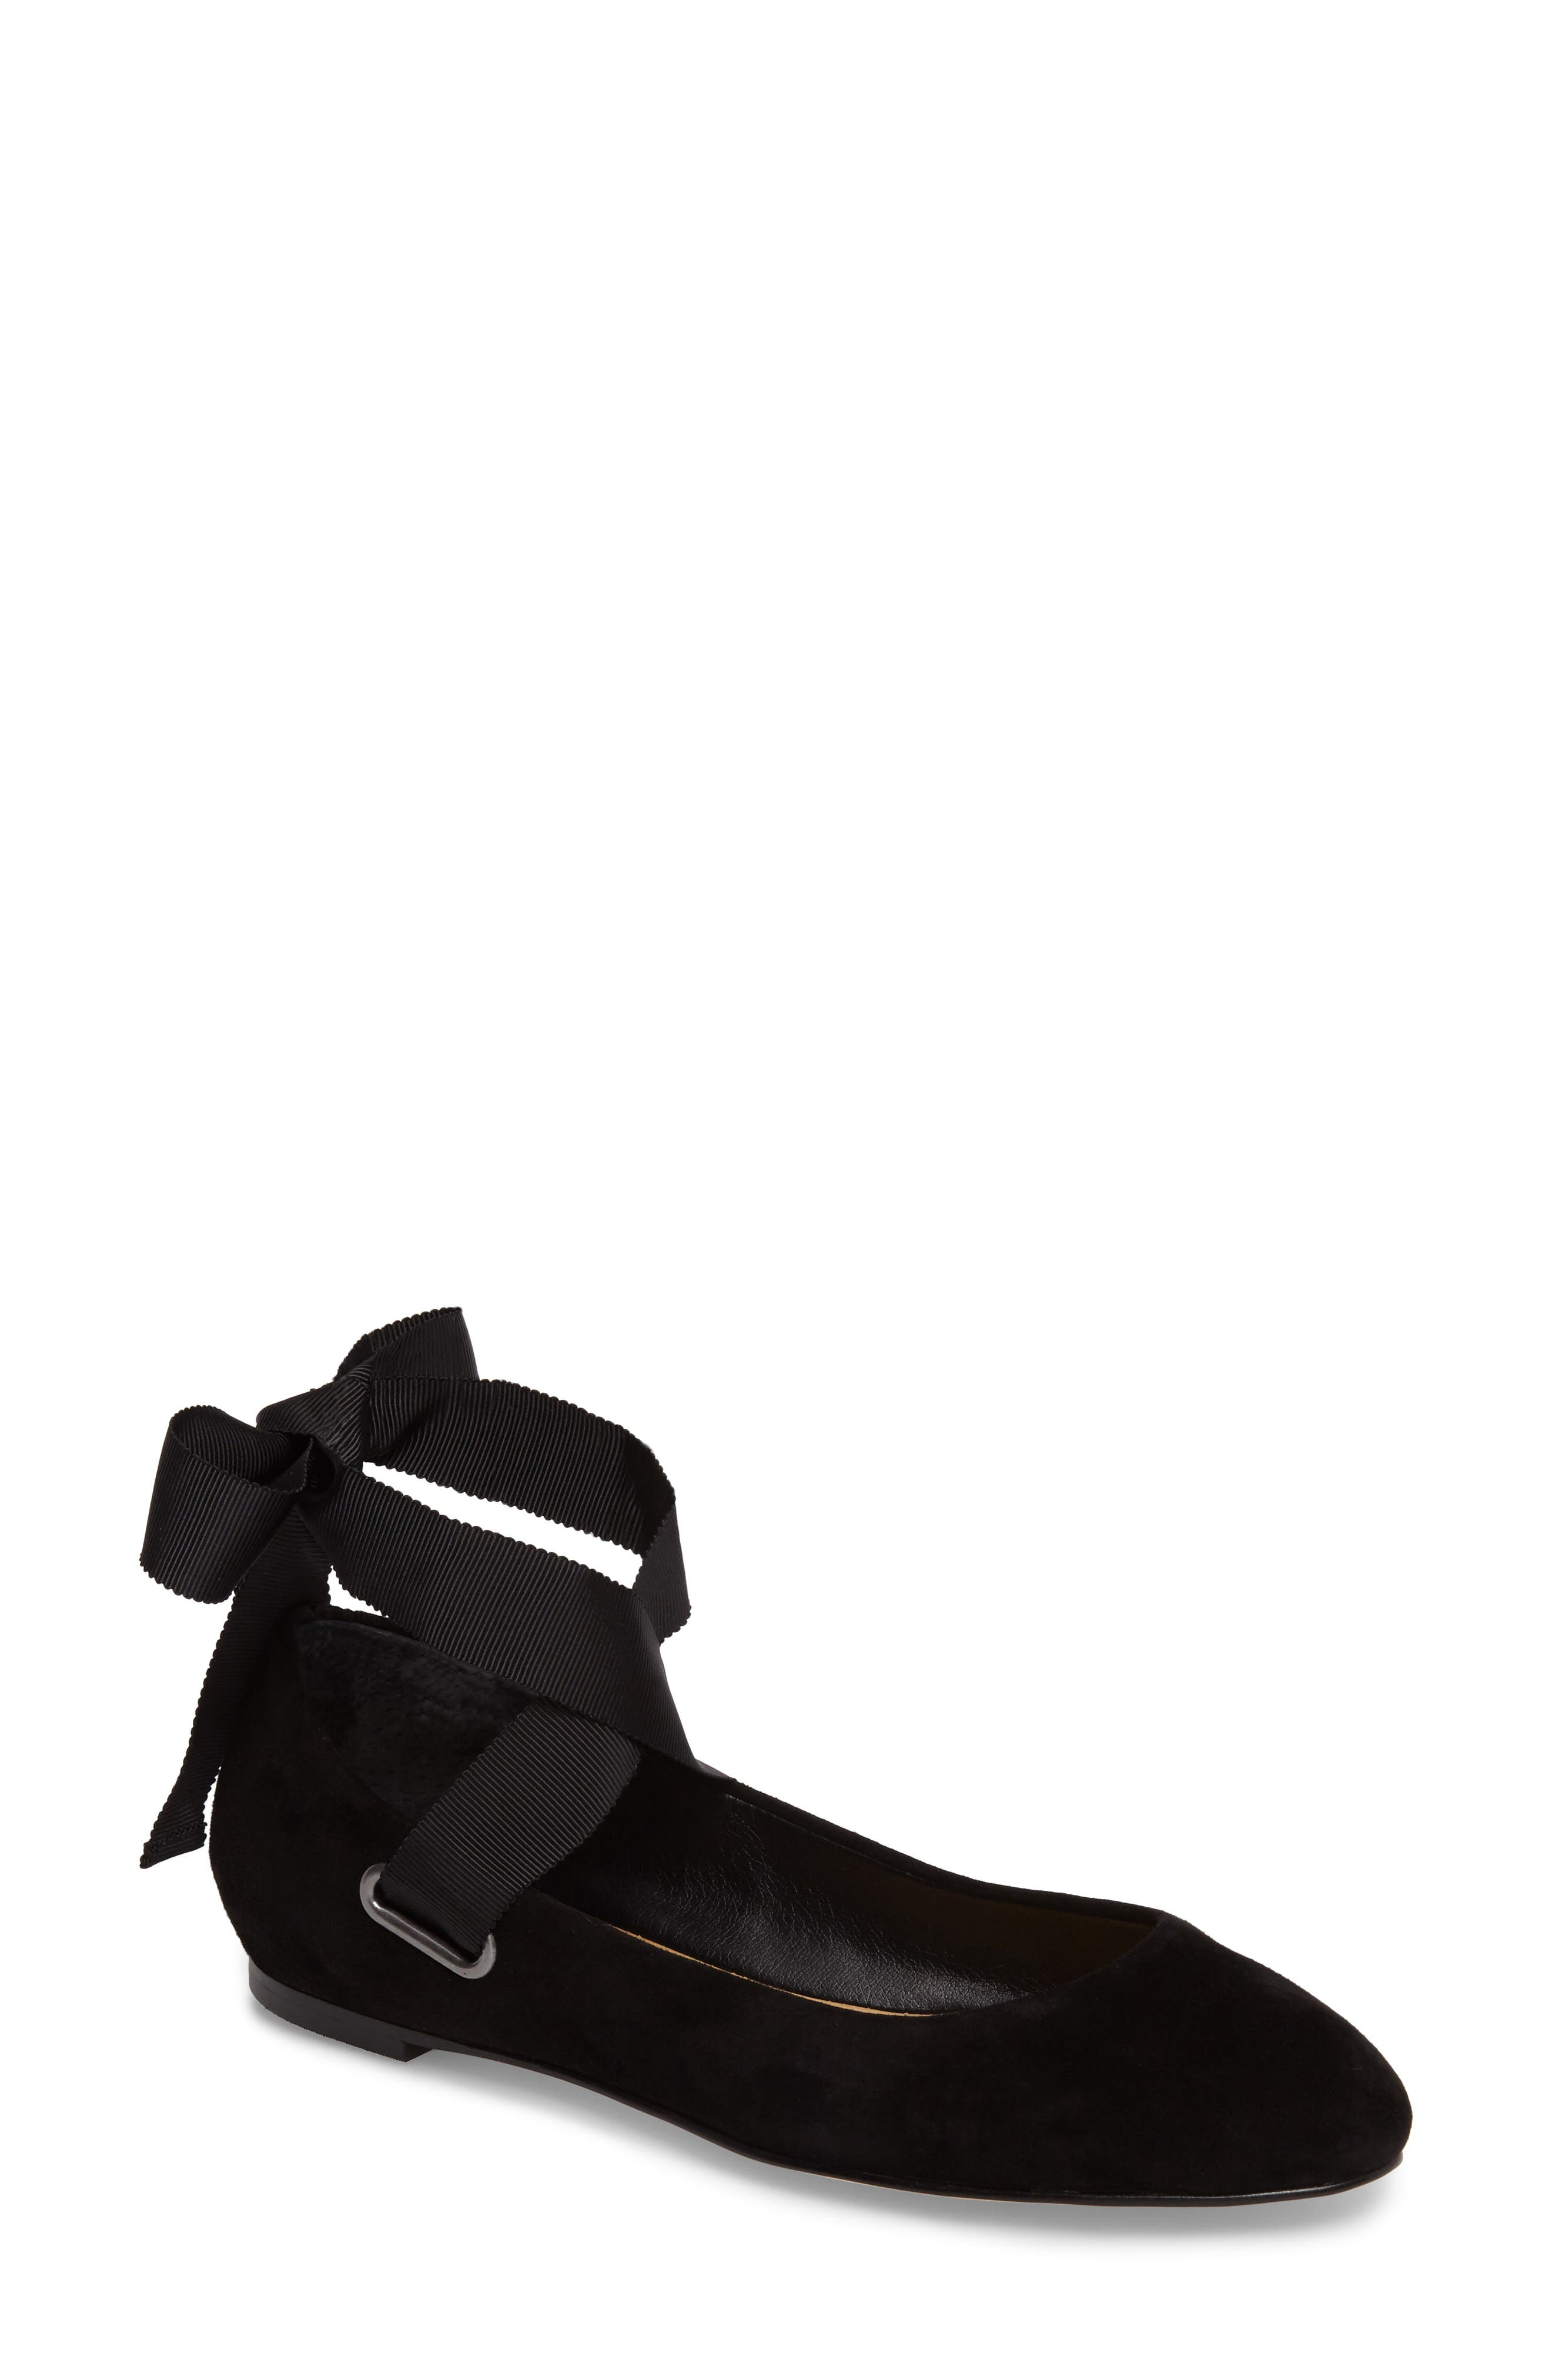 Main Image - Splendid Renee Ankle Tie Flat (Women)